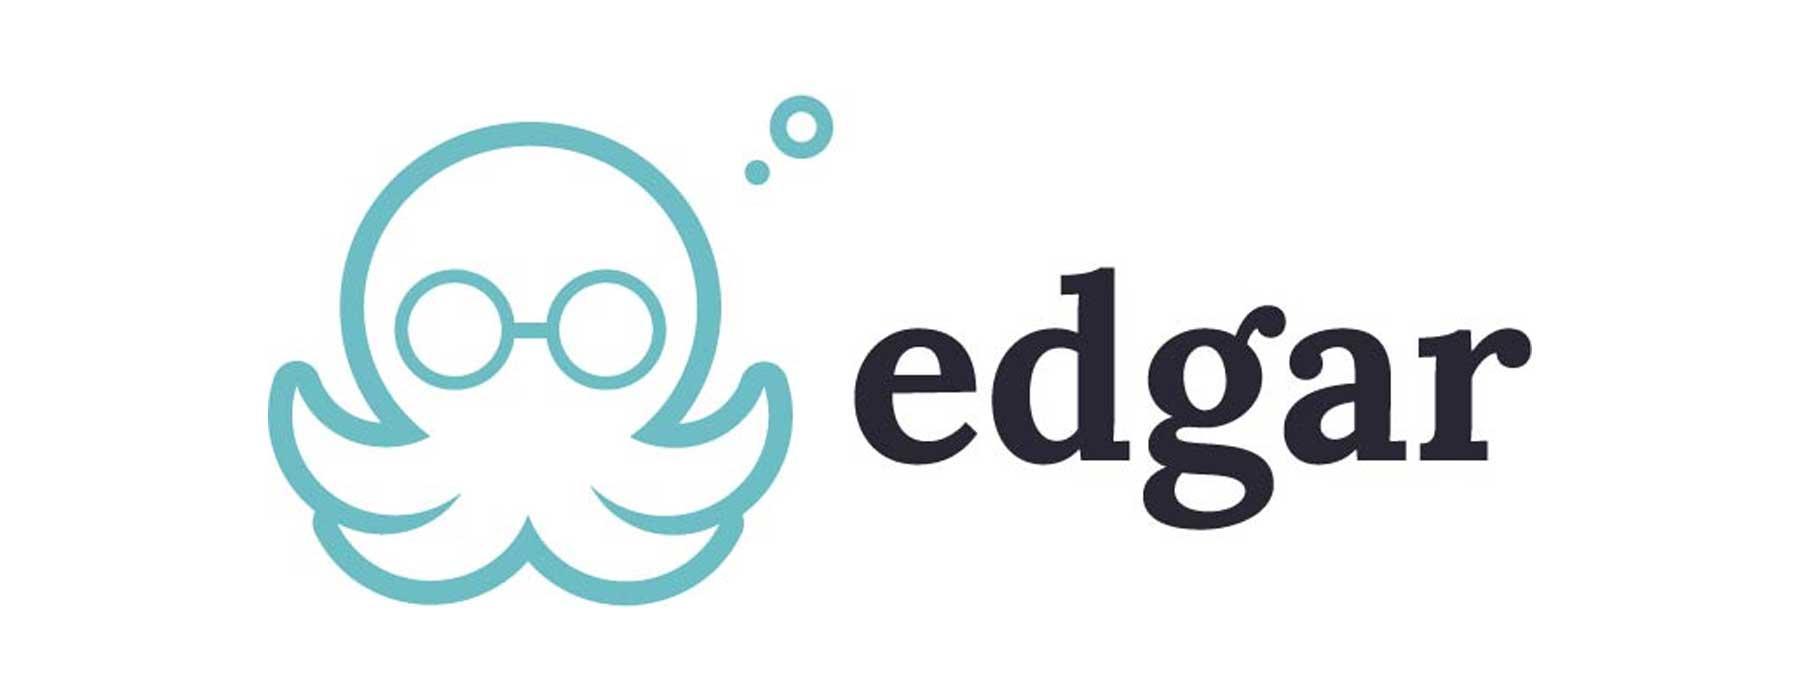 MeetEdgar Logo - Social Media Management Tool